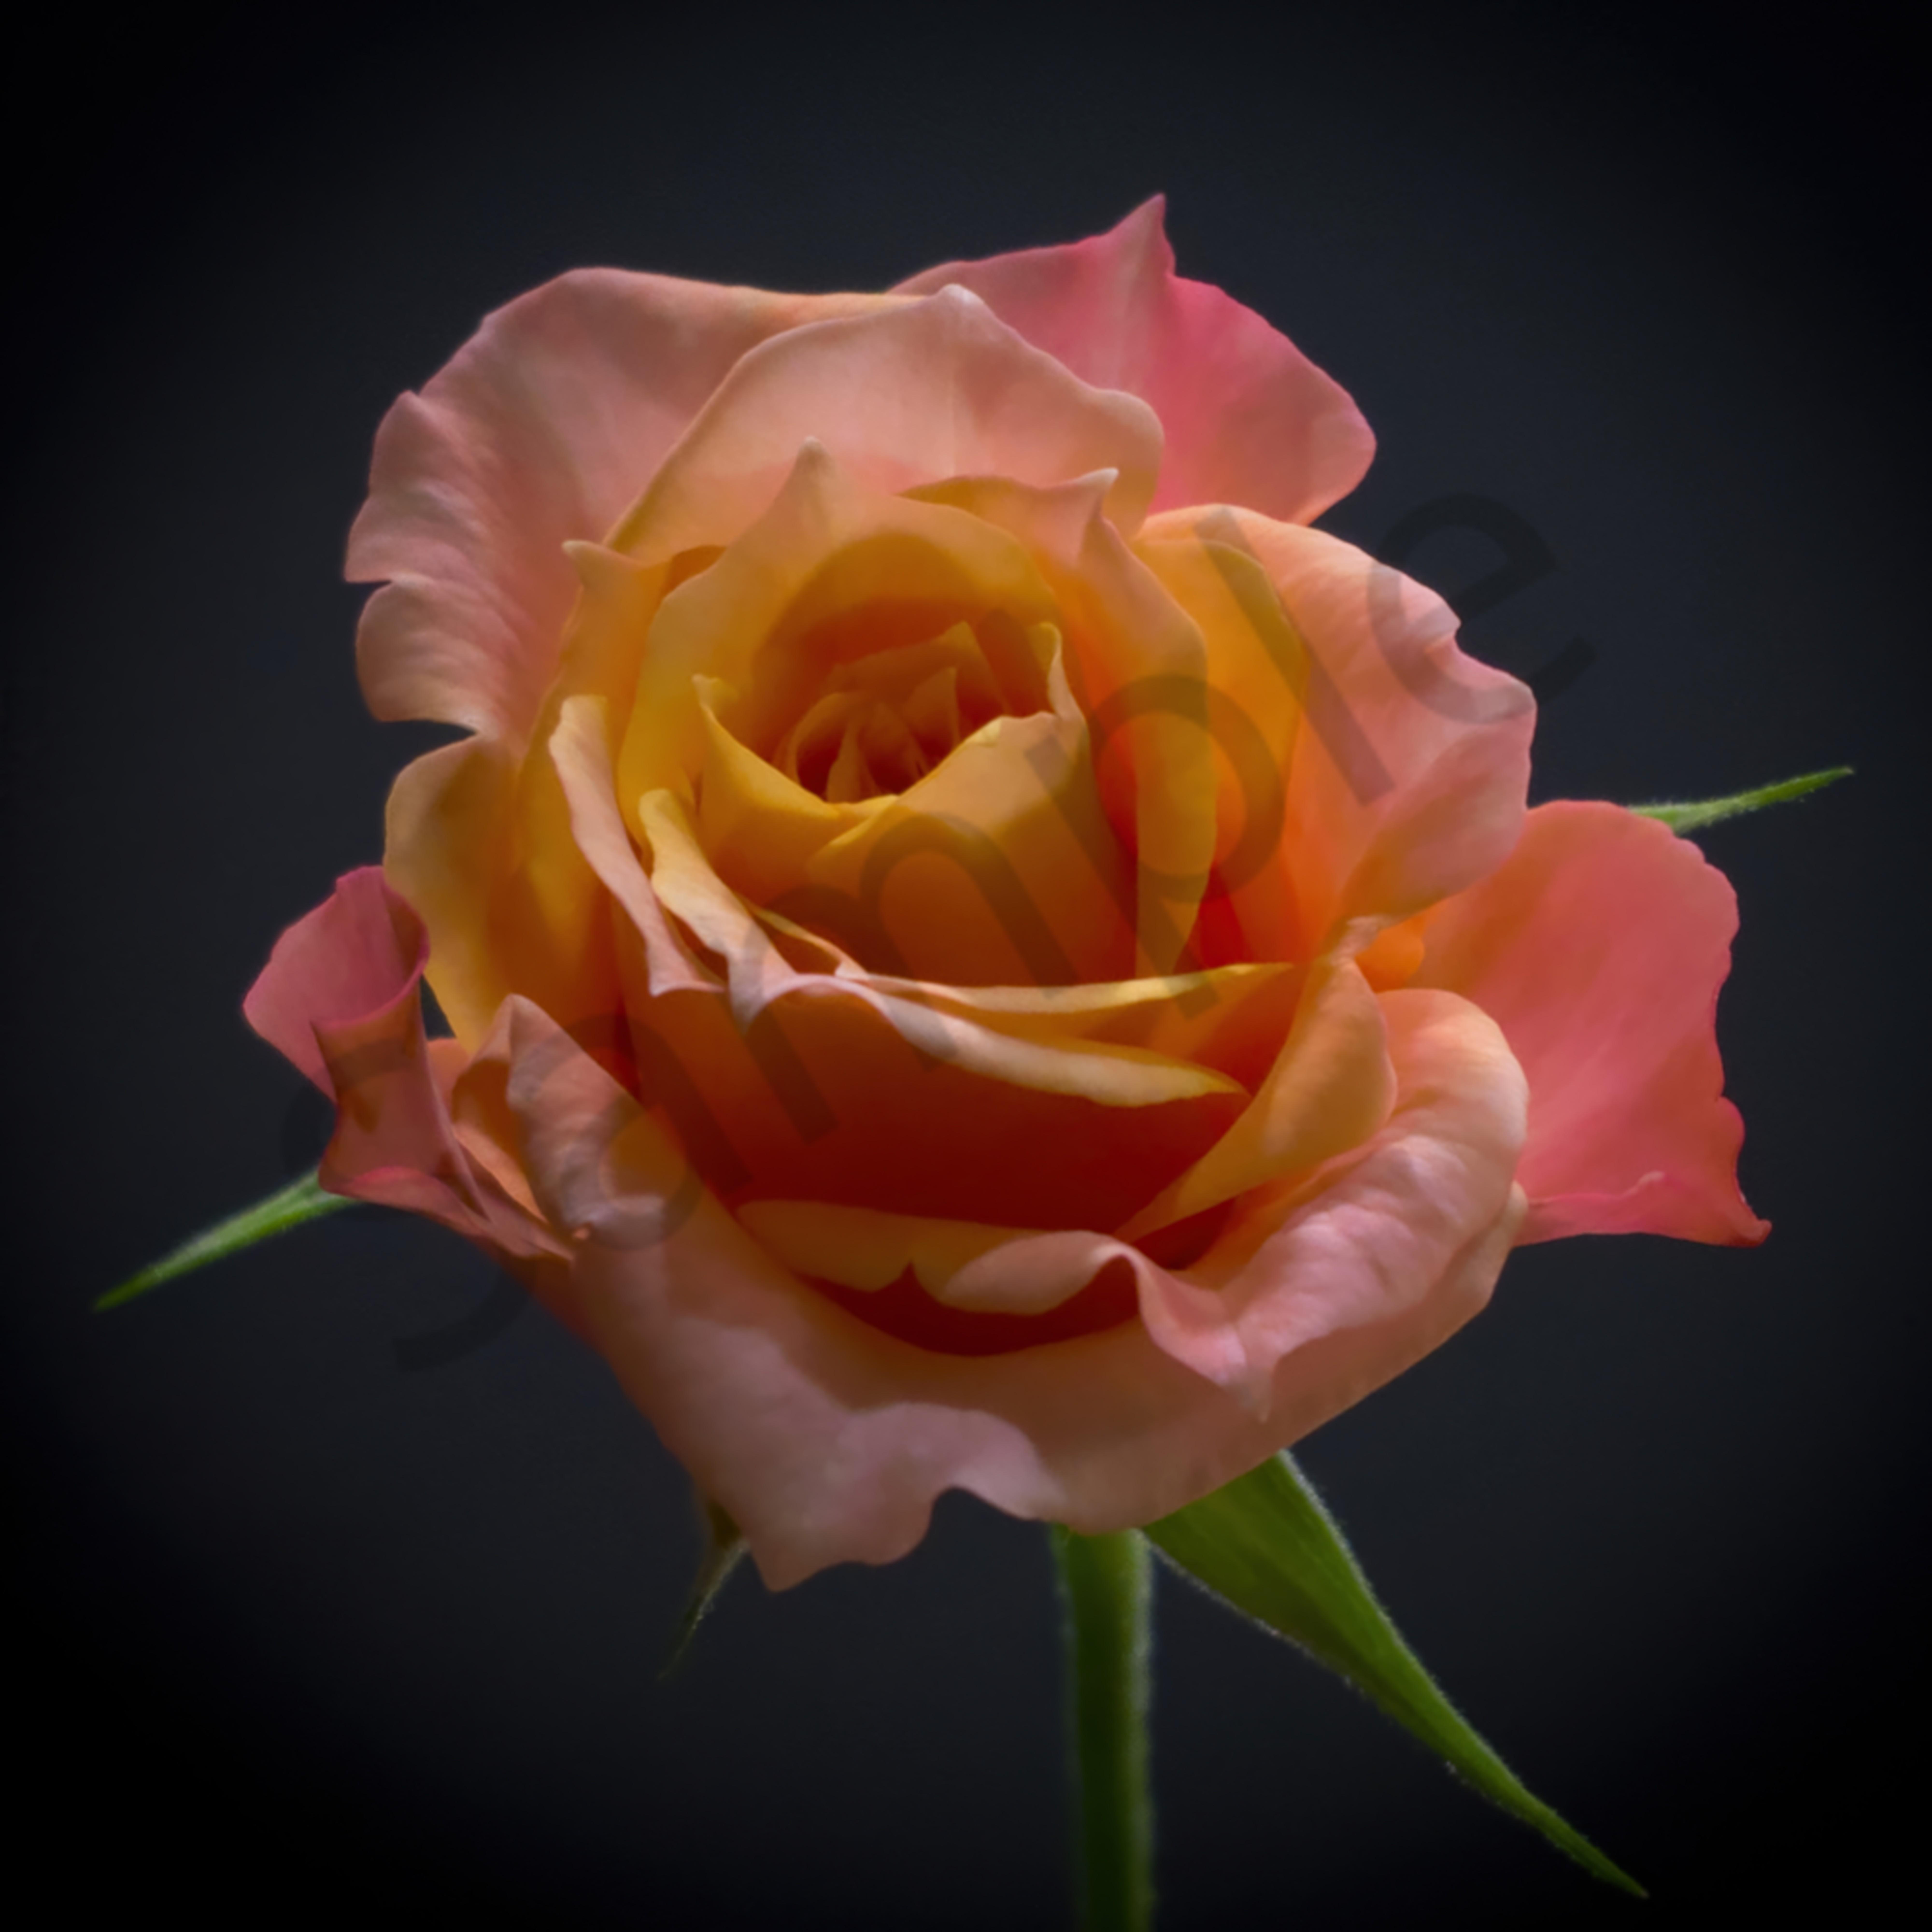 Miniature rose jijple